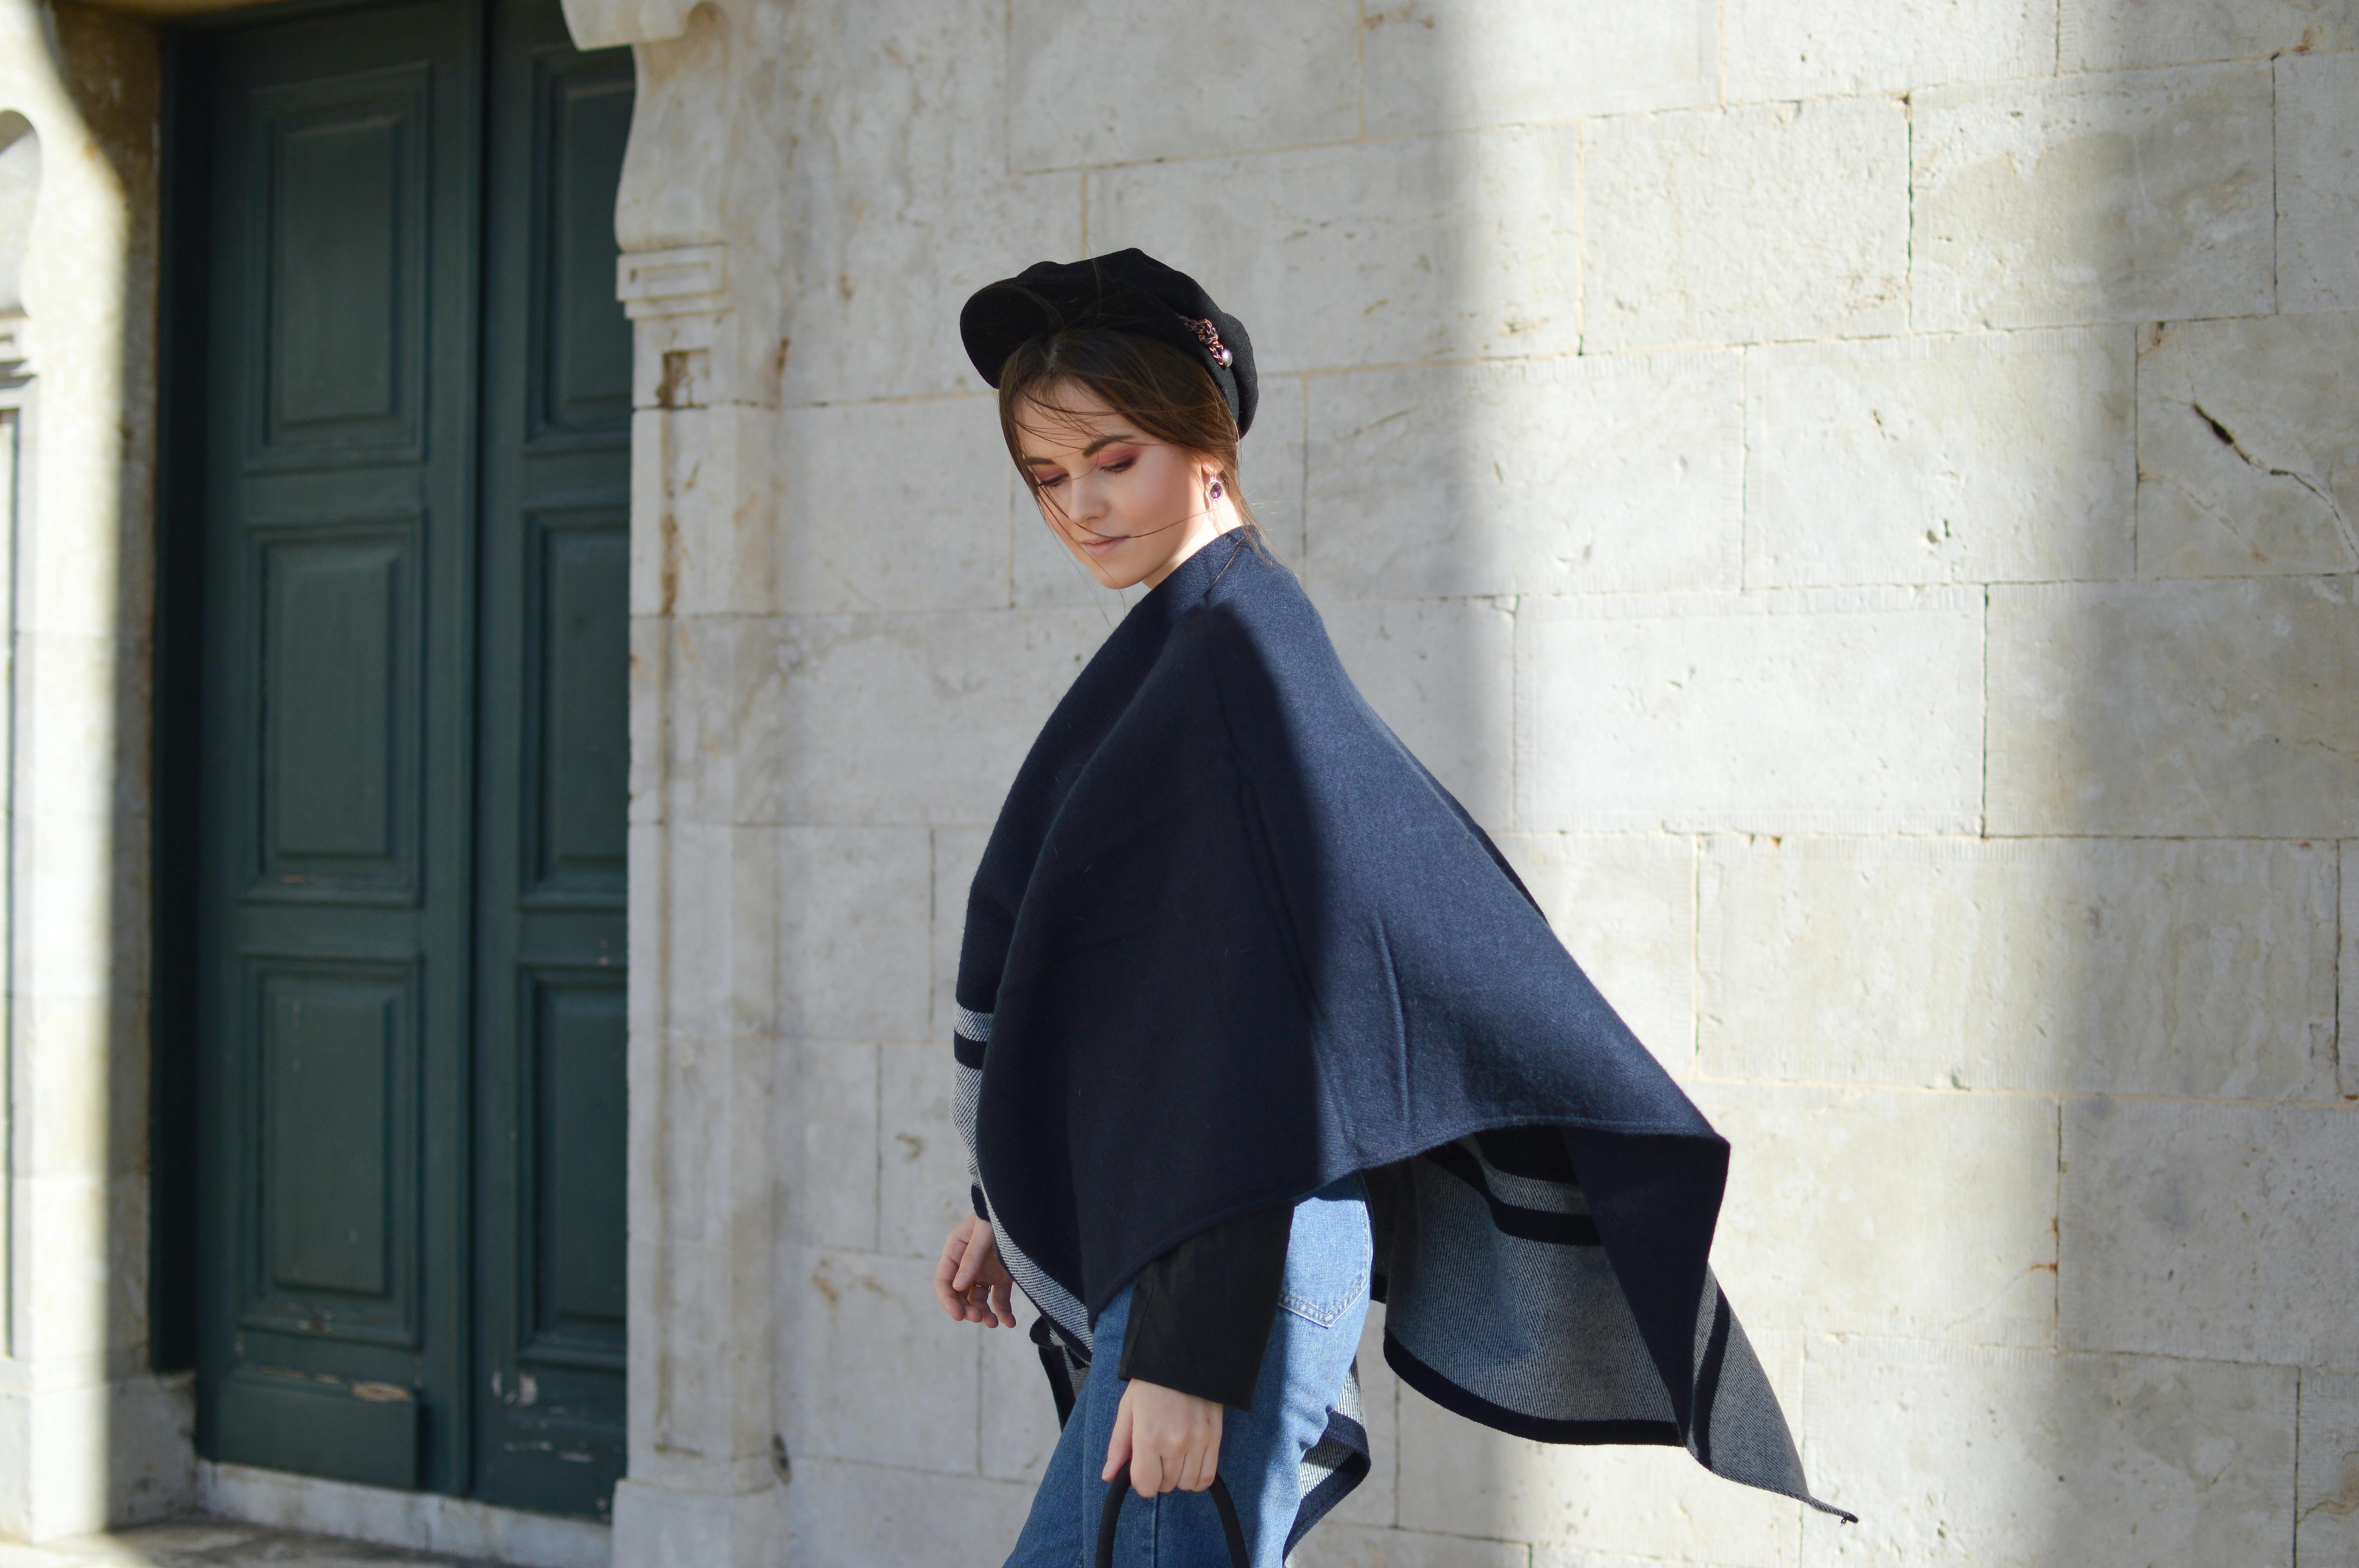 woman wear black scarf posing near wall